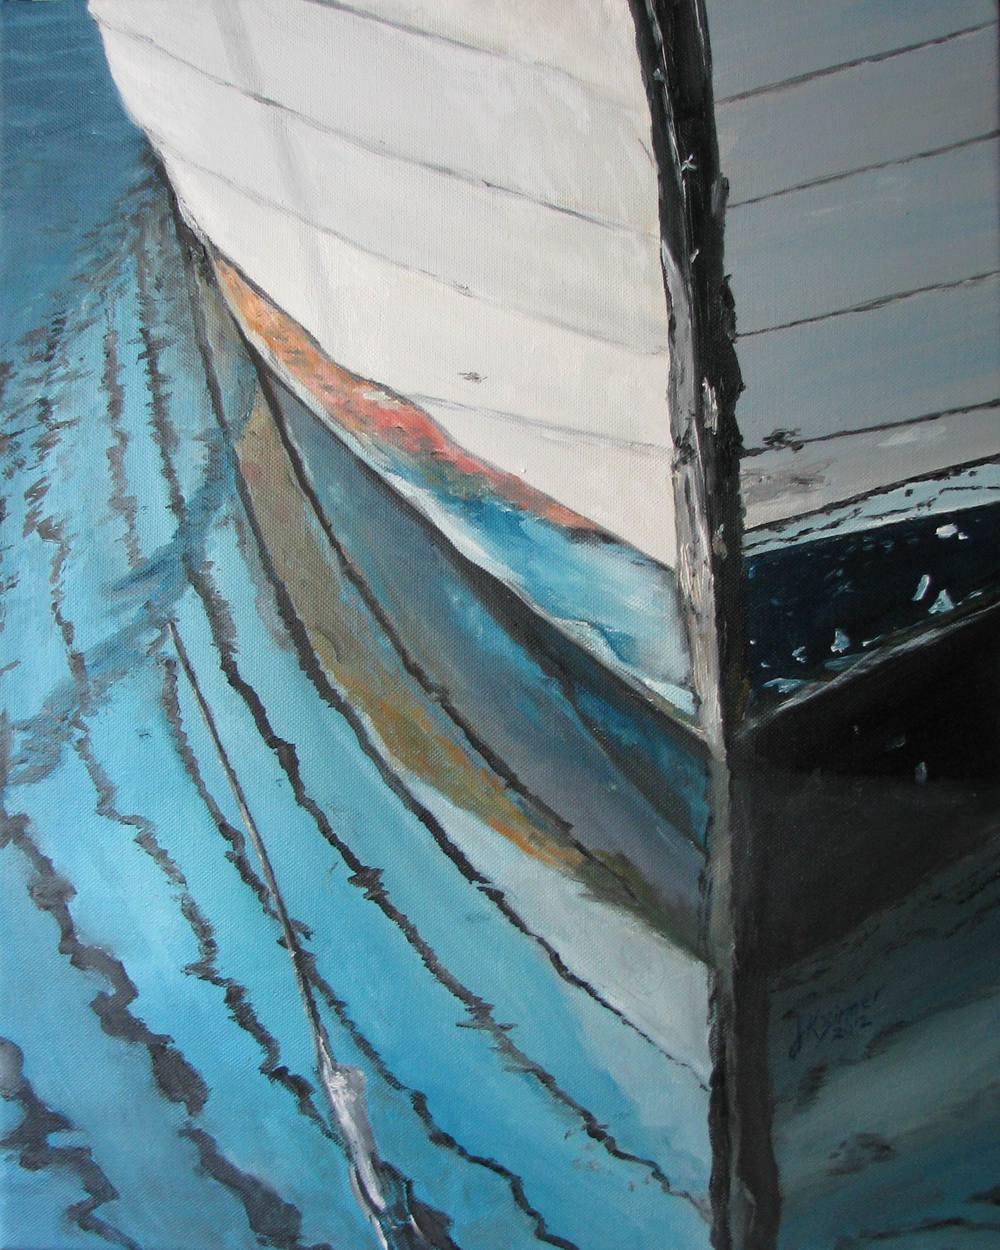 Boat Hull - 16x20